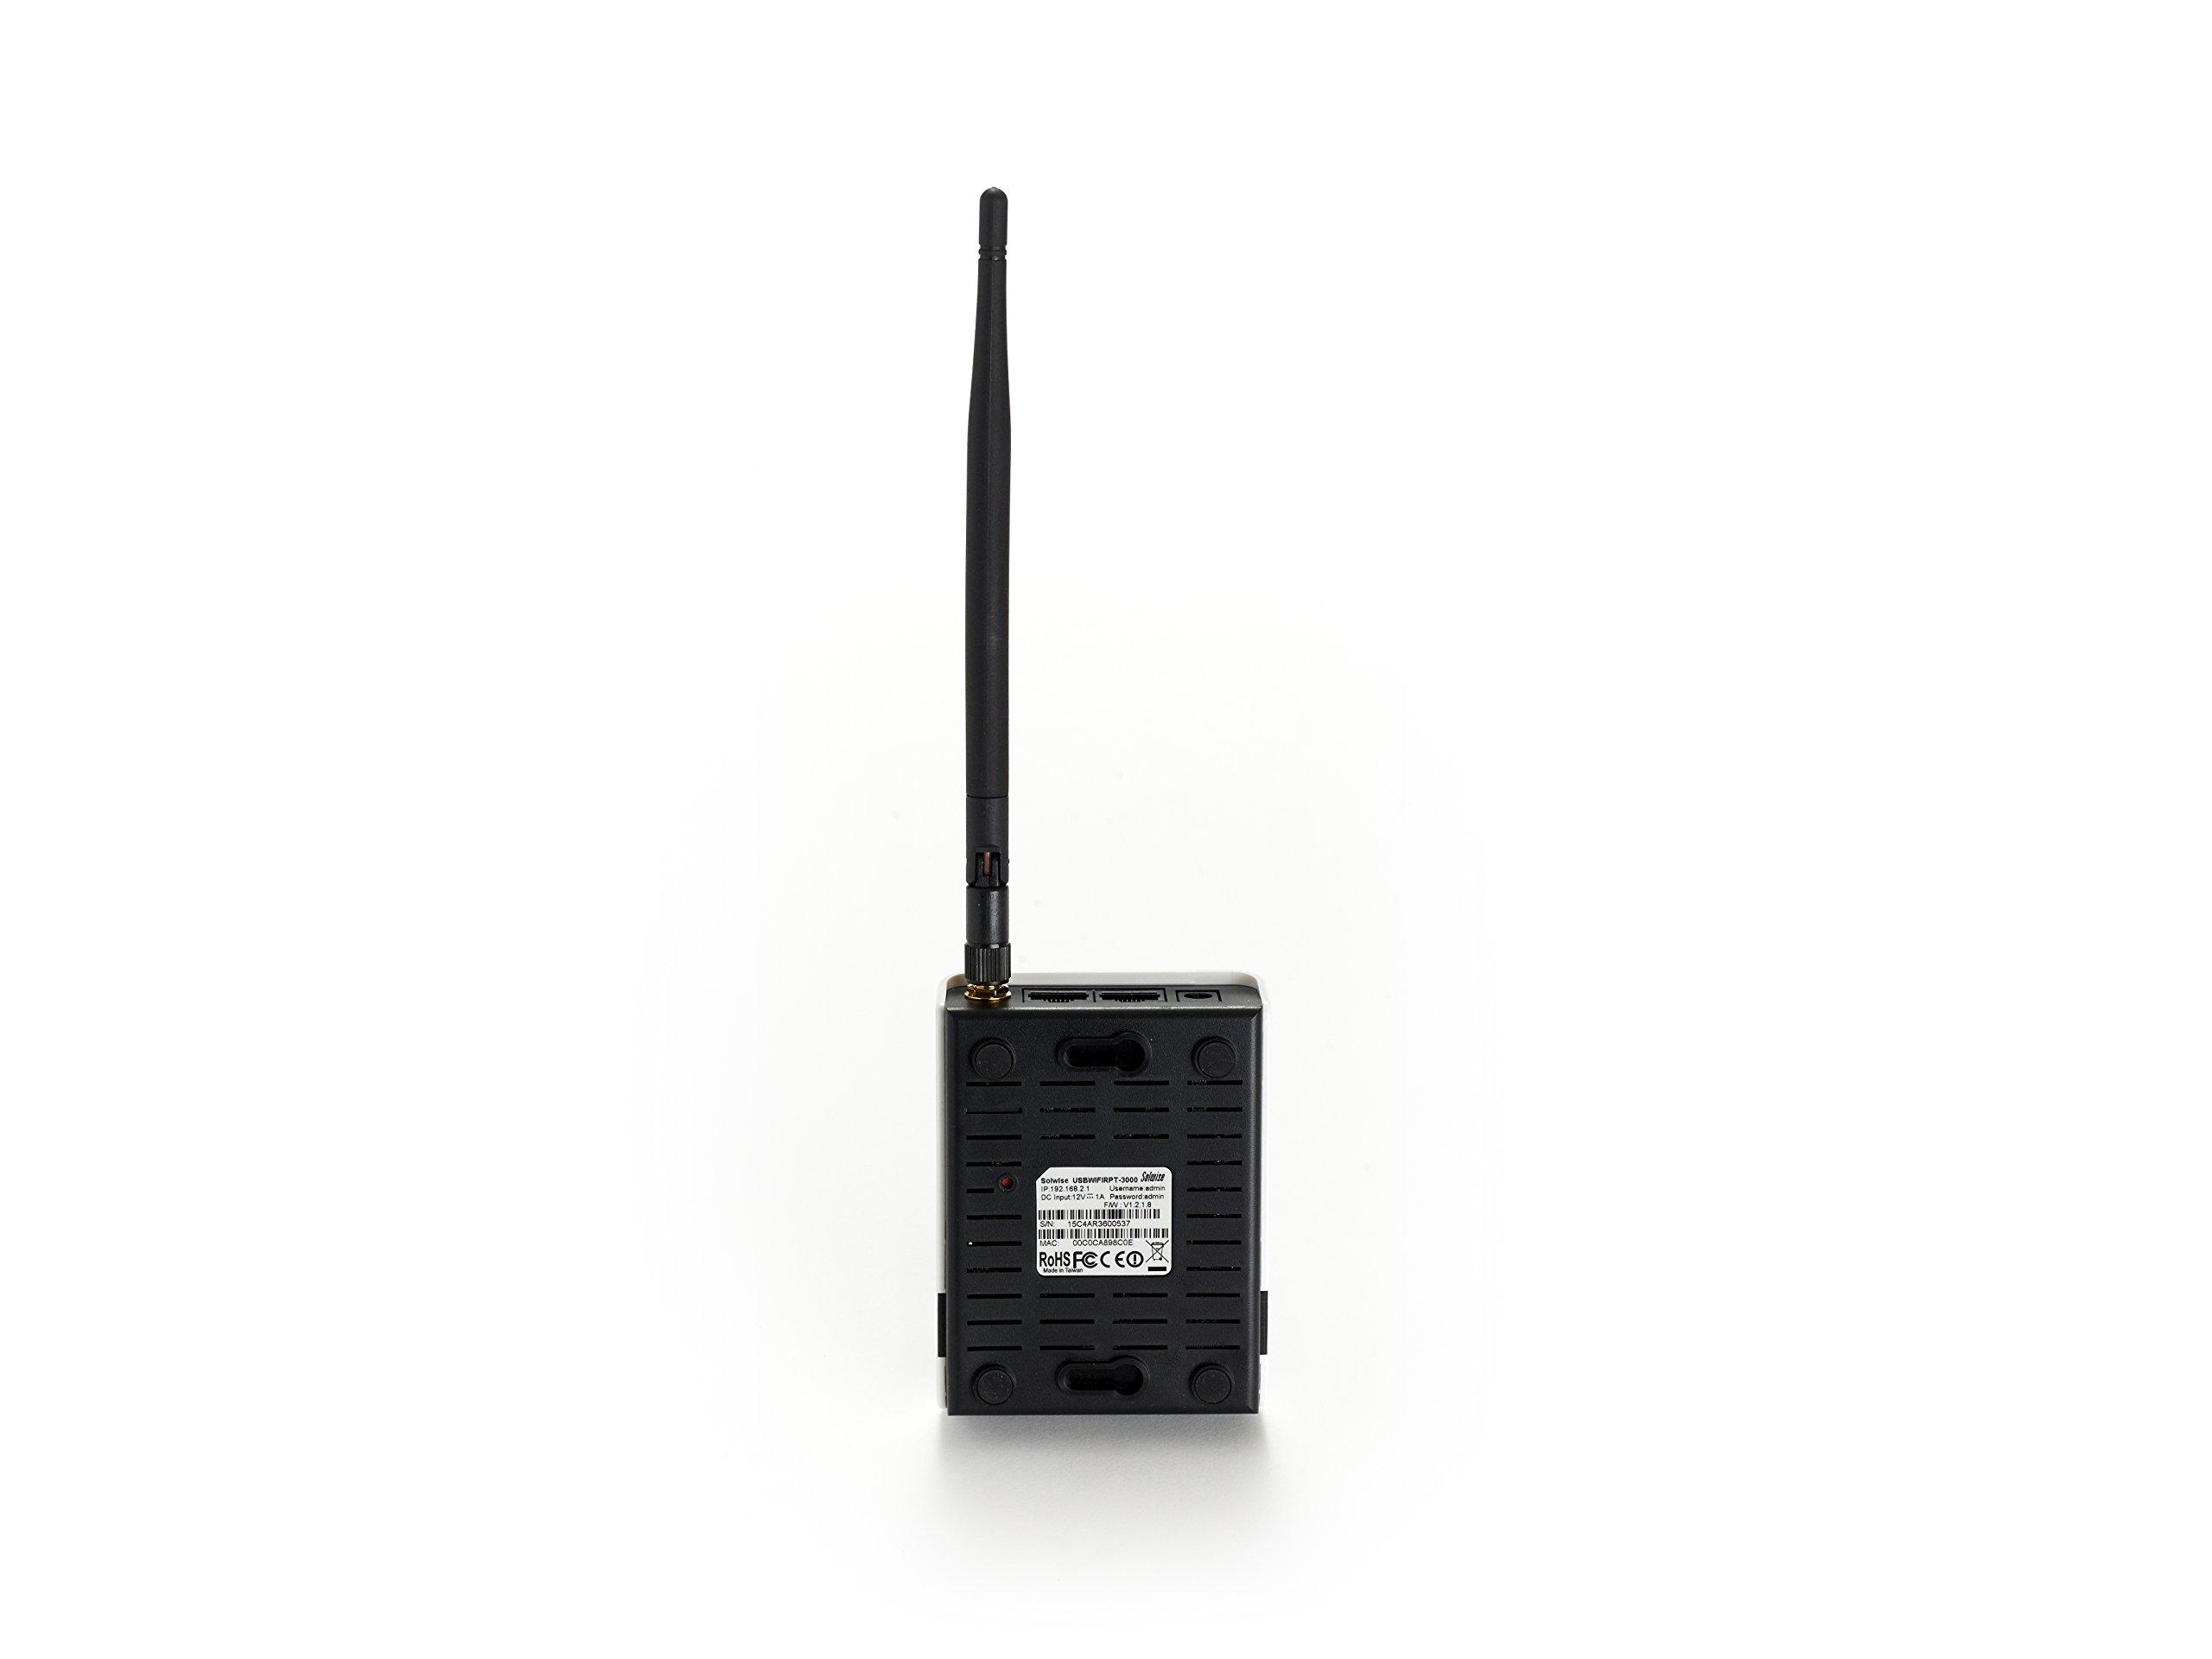 Kuma Hi-Gain Long Range Wireless Wifi Signal Booster Extender Hotspot Access Point Network Repeater for RVs, Motorhomes, Trucks & Boats by KUMA (Image #3)